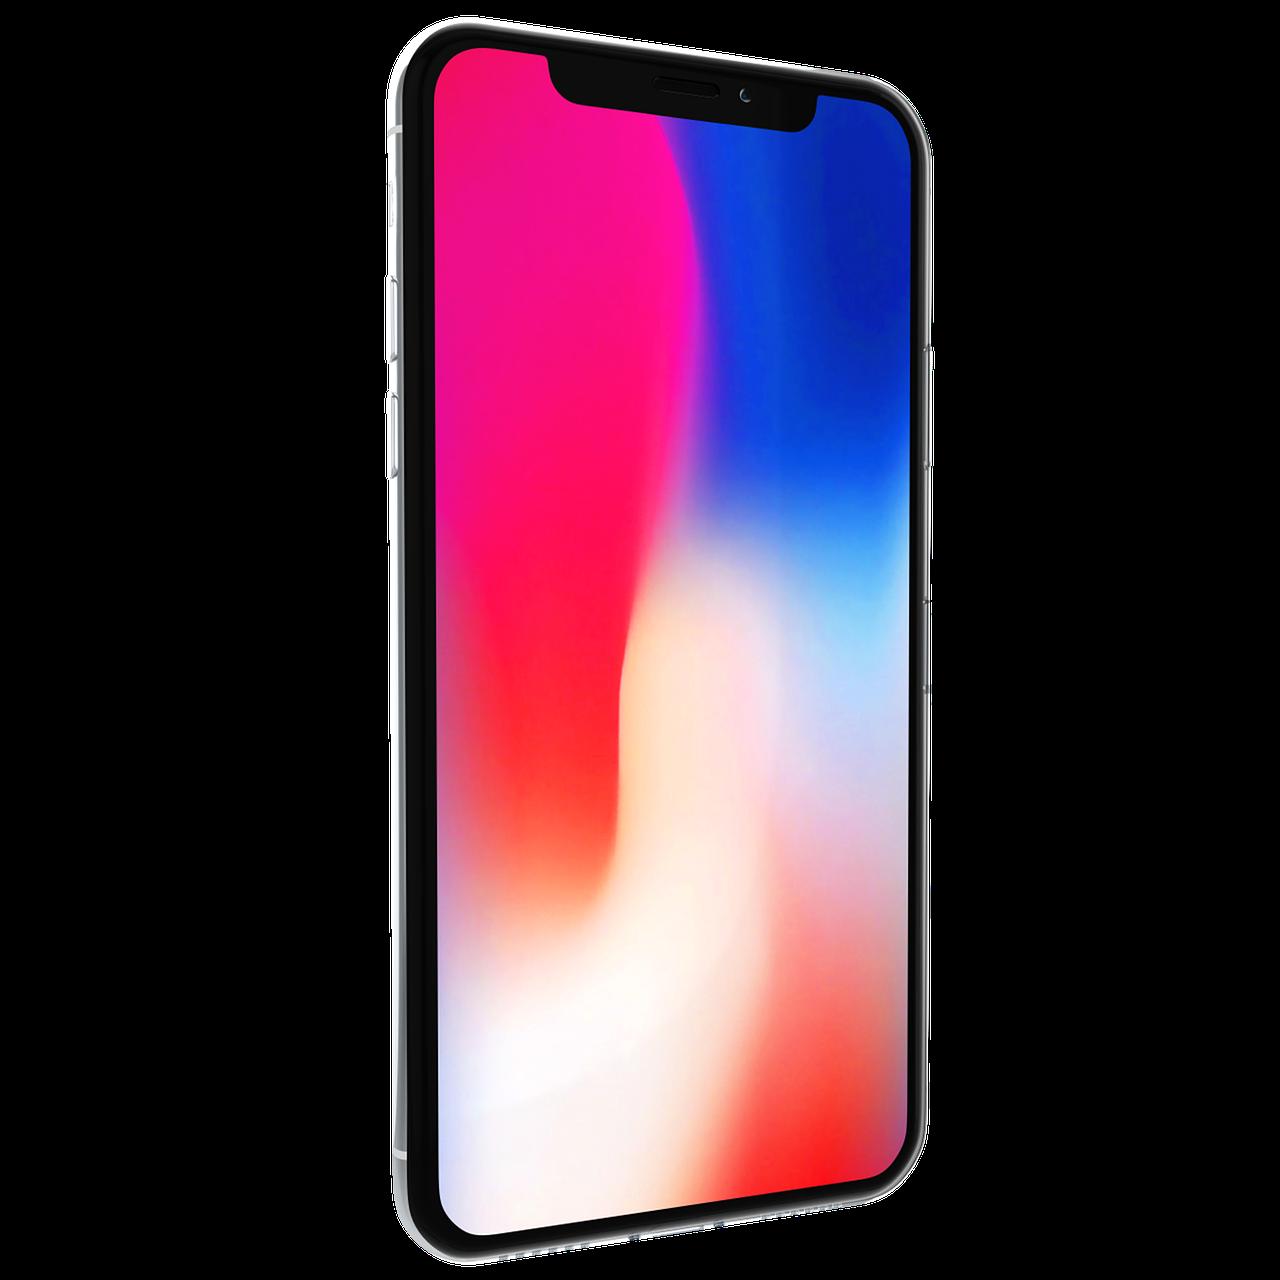 iPhoneXは他のiPhoneと何が違うの?〜iPhoneX使用者の意見も交えて〜